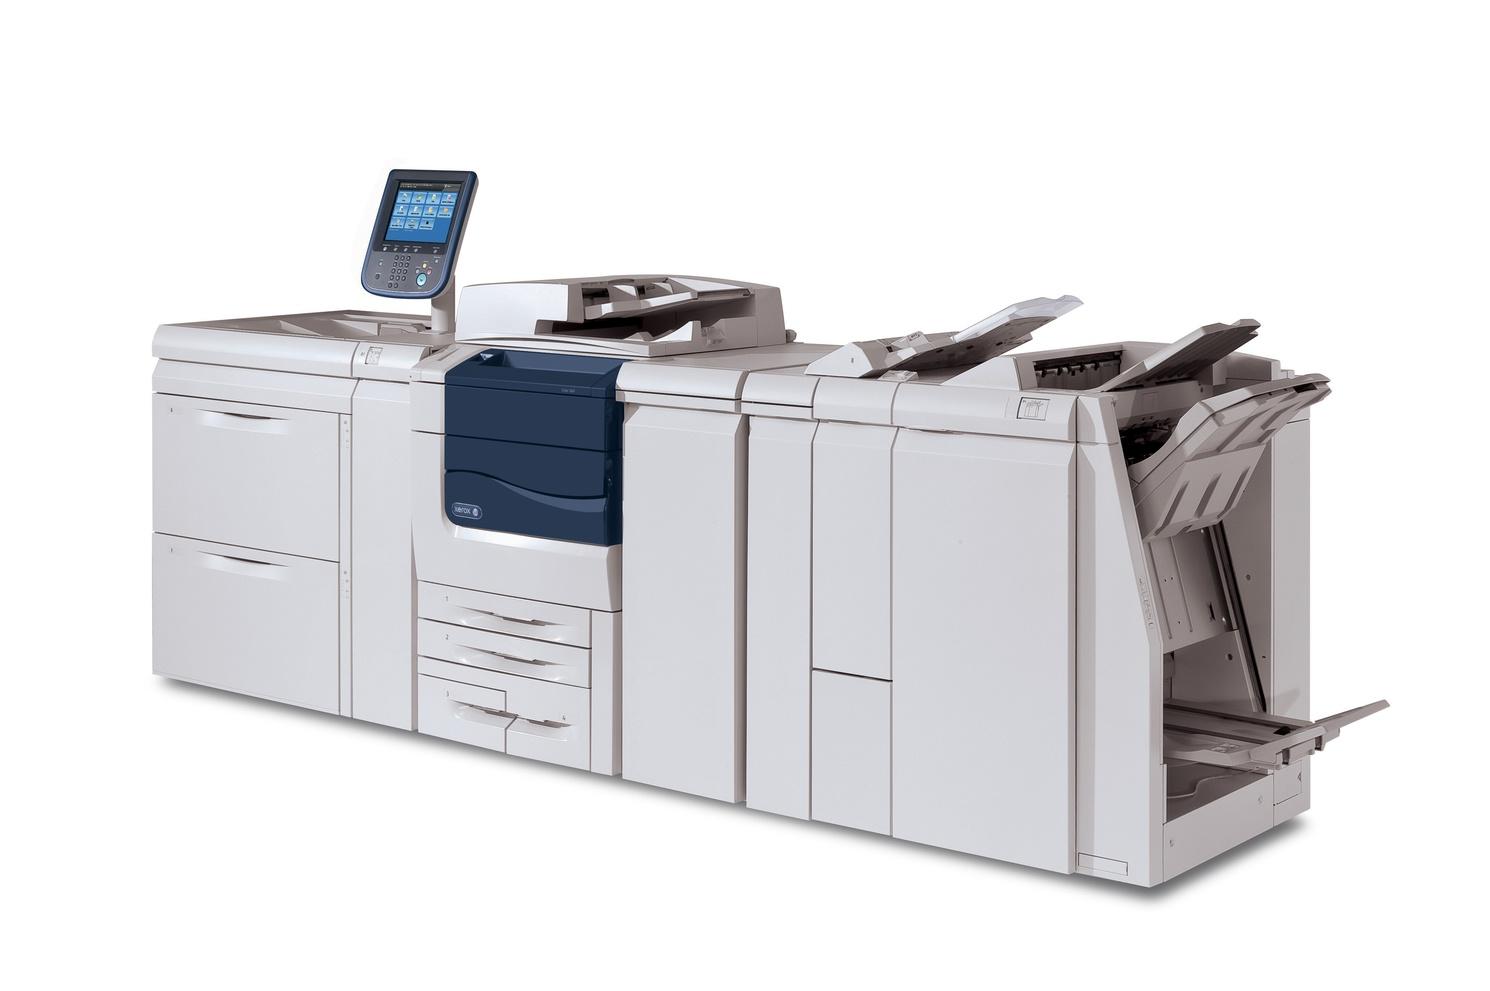 Xerox Color 550 Printer Toner Cartridges